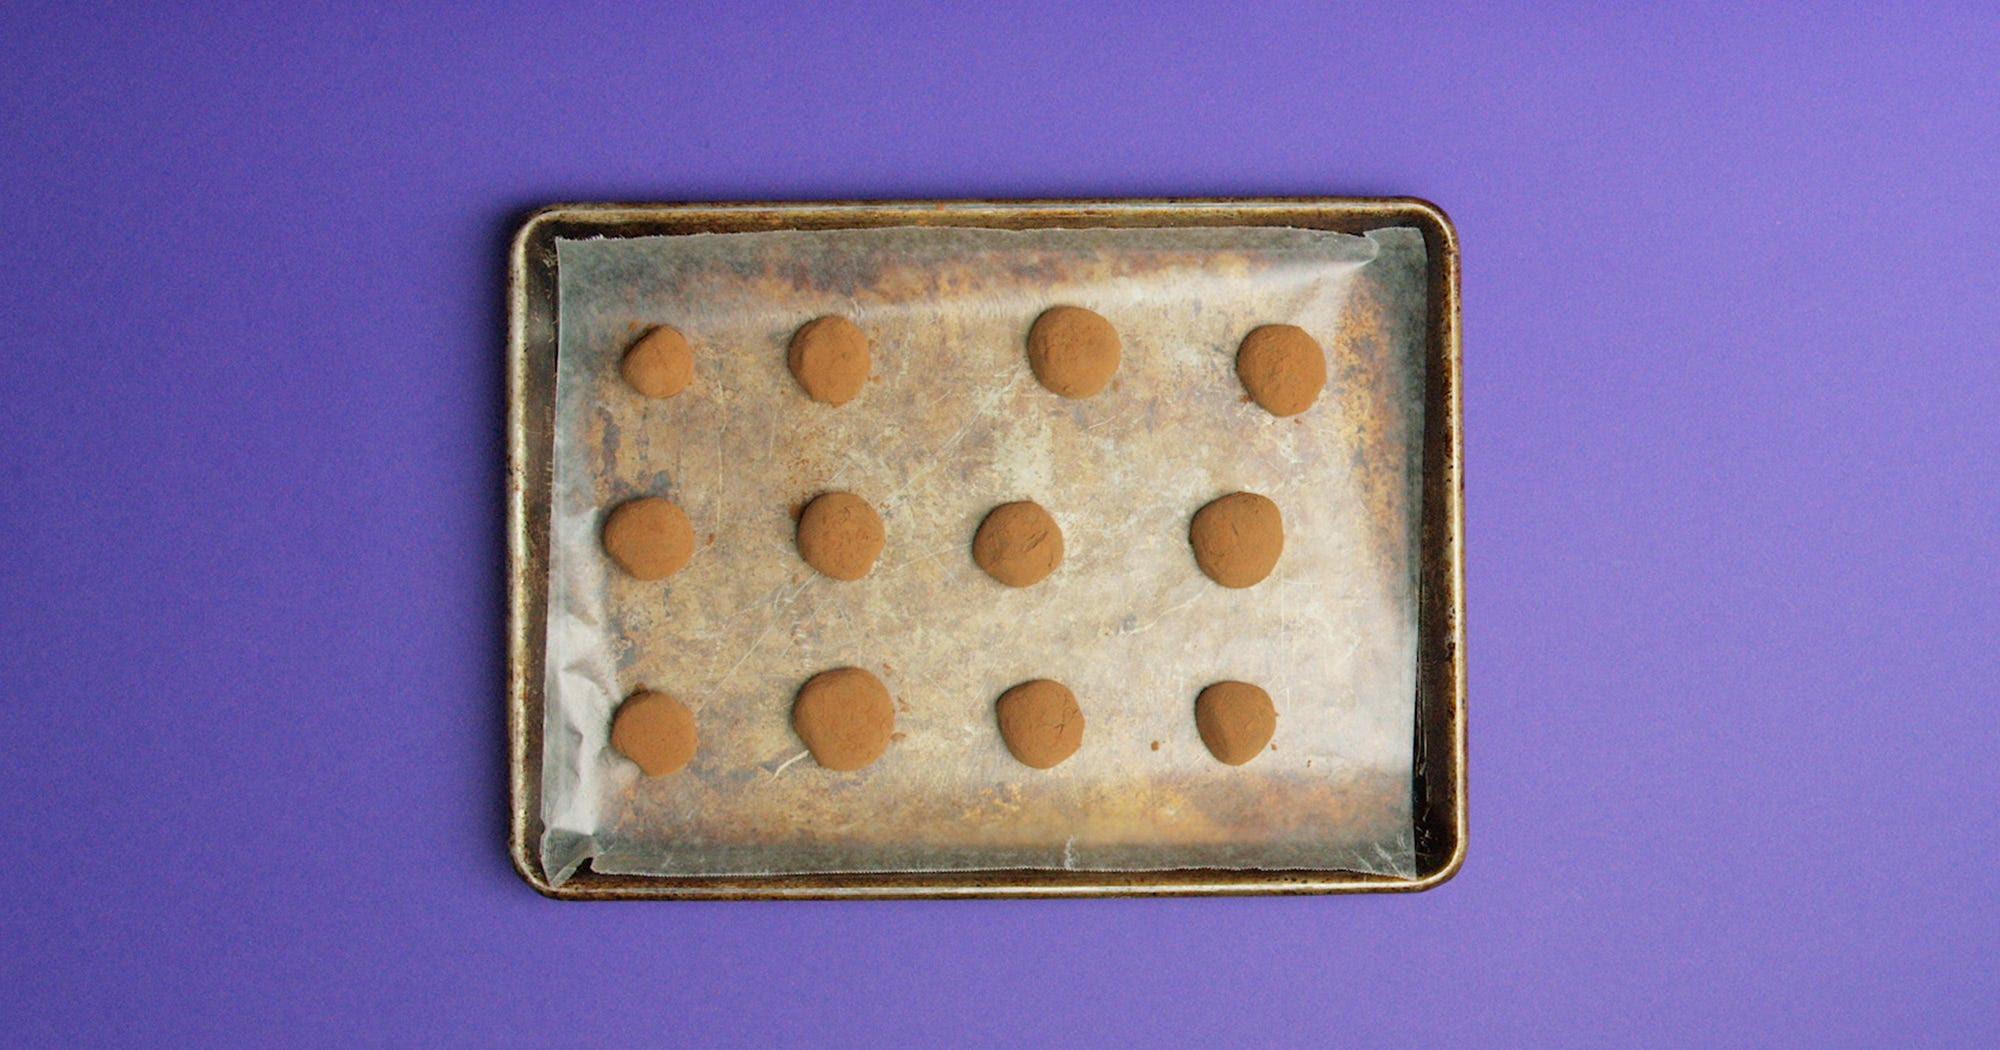 Chocolate Truffle Recipe Video - Easy Dessert Recipe